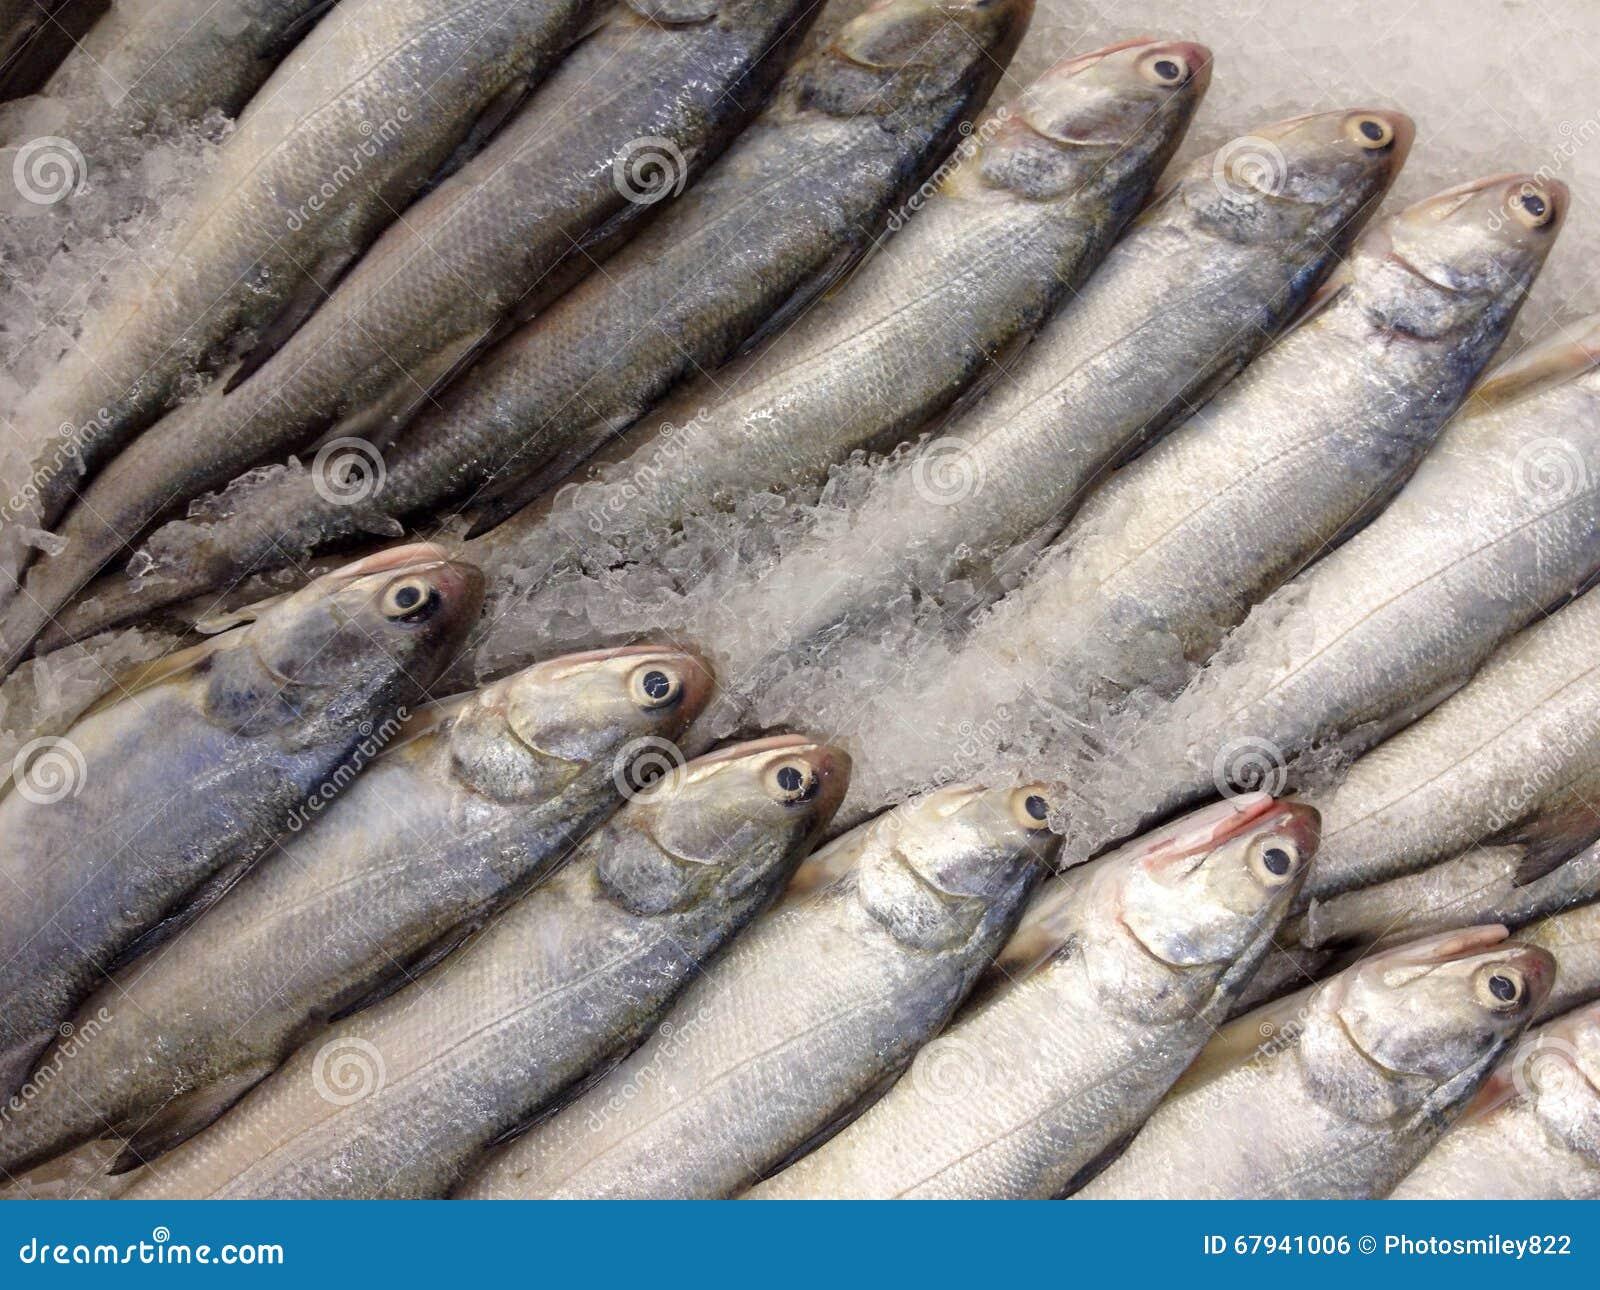 Indian salmon fish - photo#41